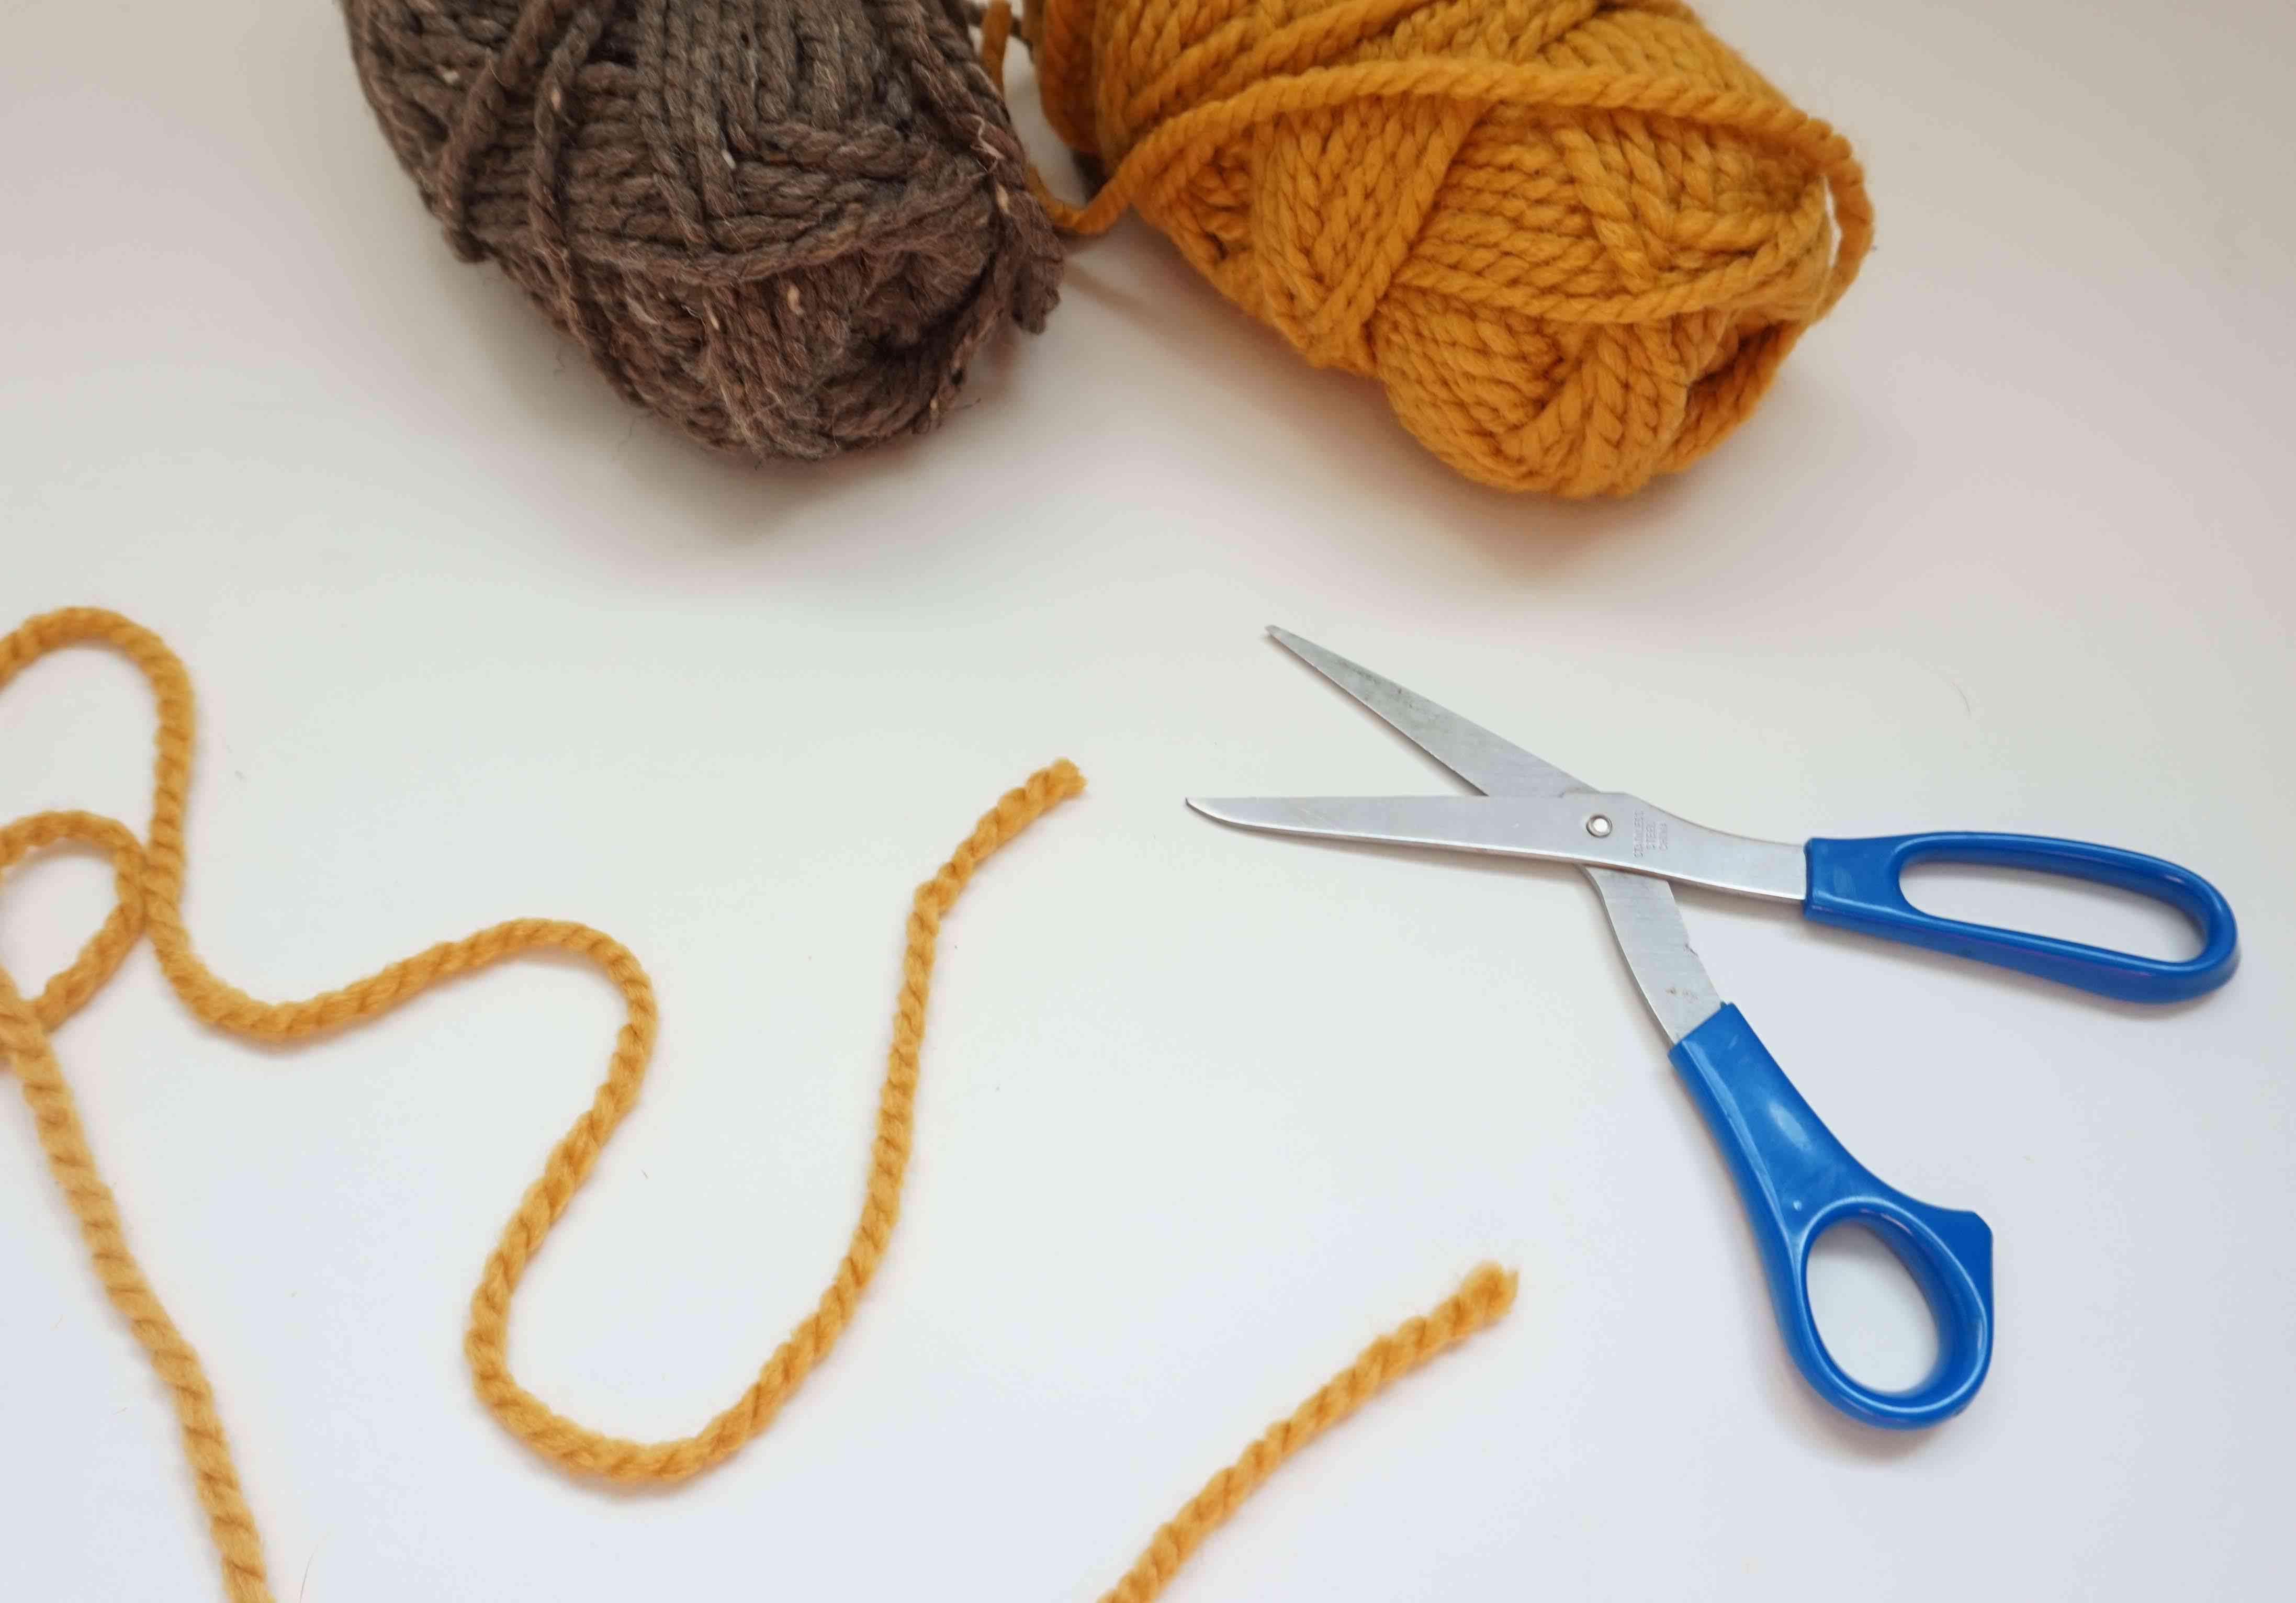 Scissors and yarn.